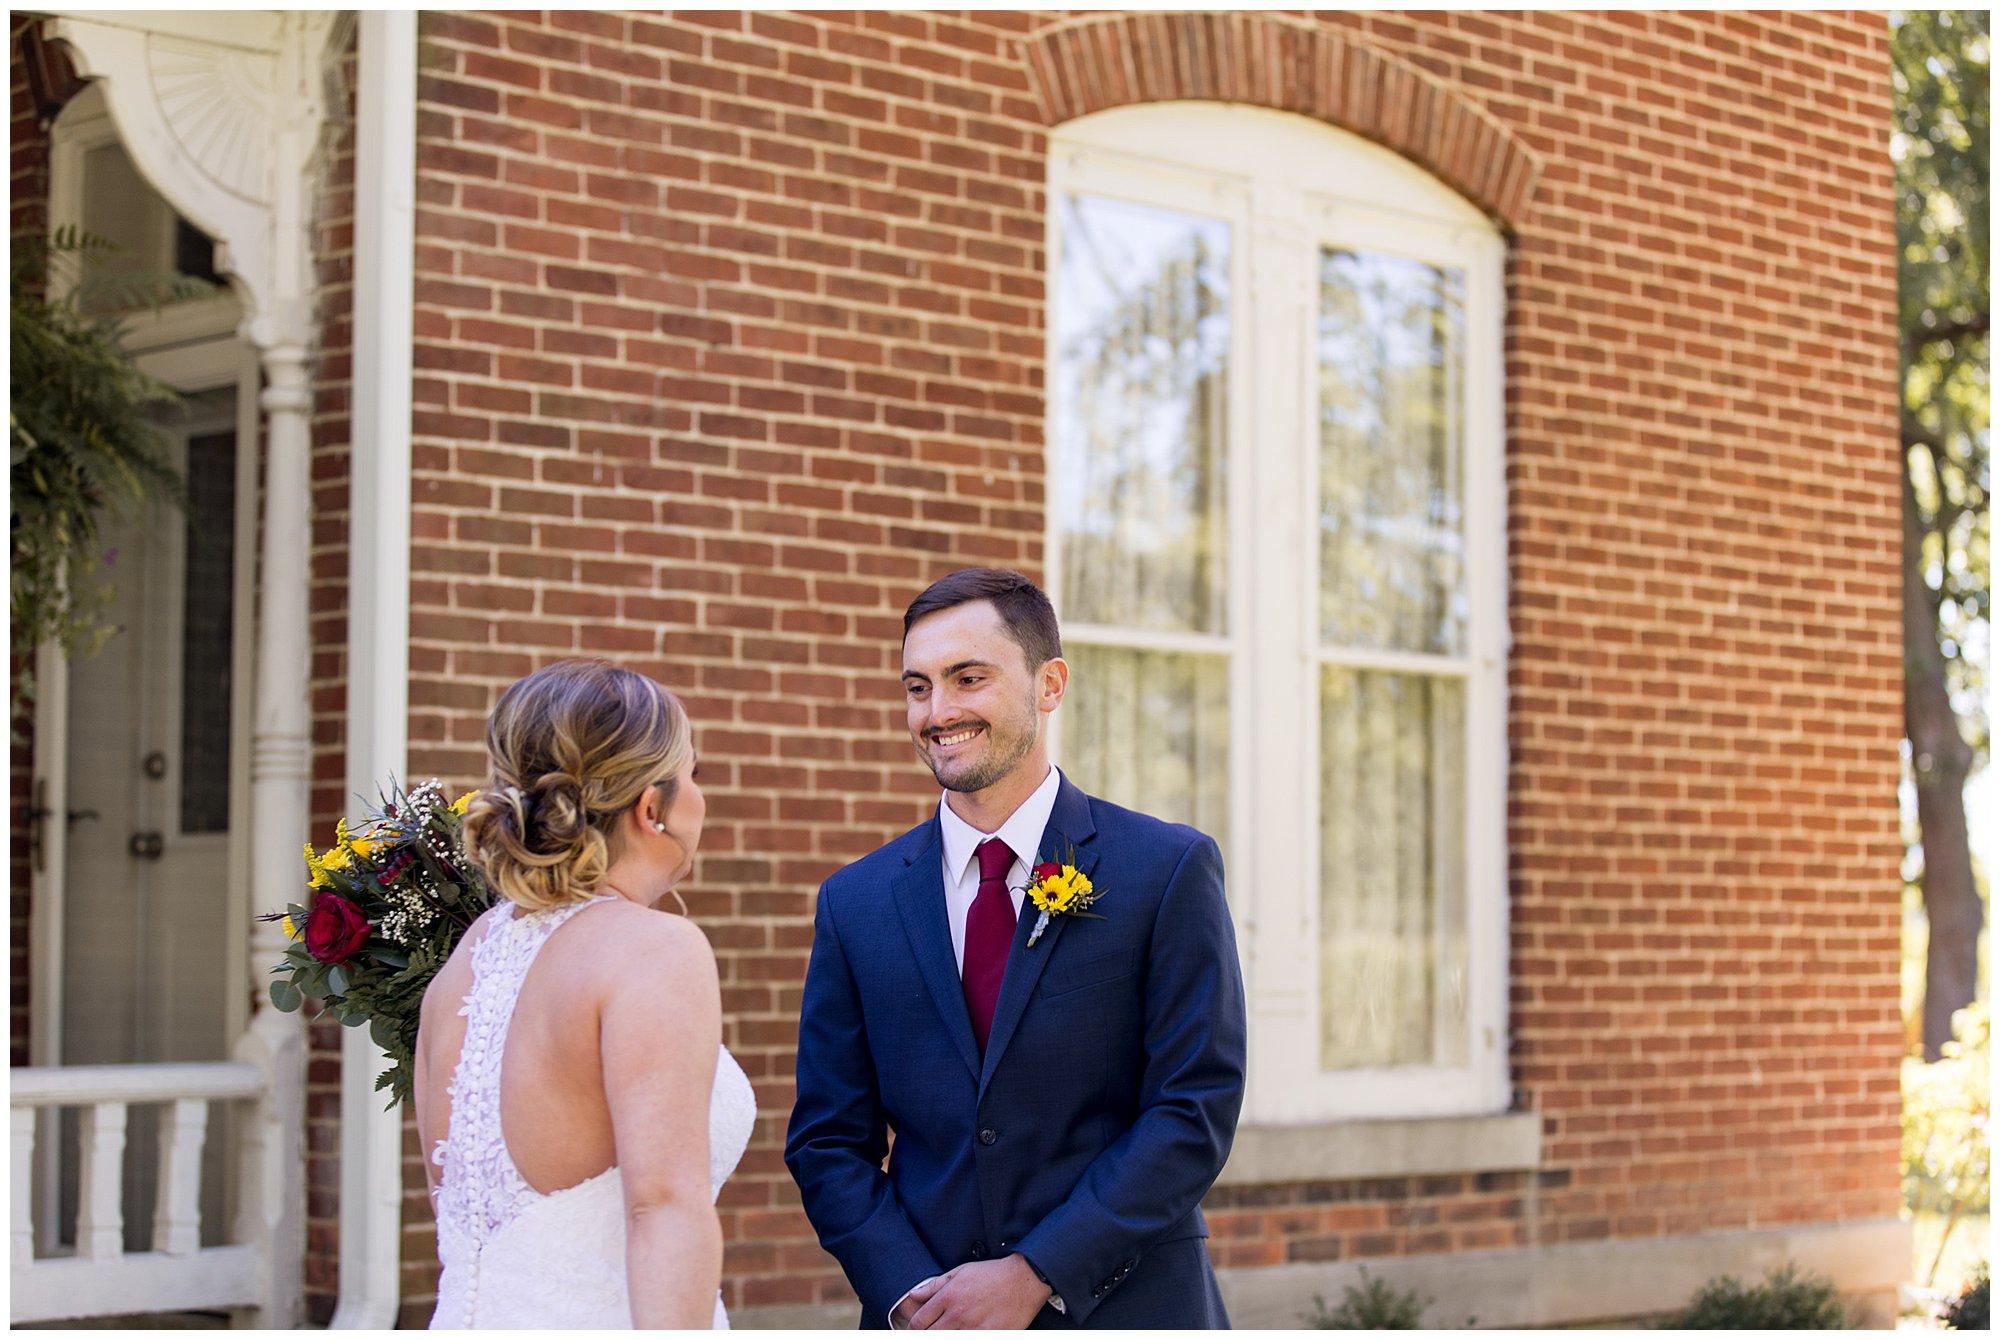 bride and groom first look before rustic Legacy Barn wedding in Kokomo Indiana